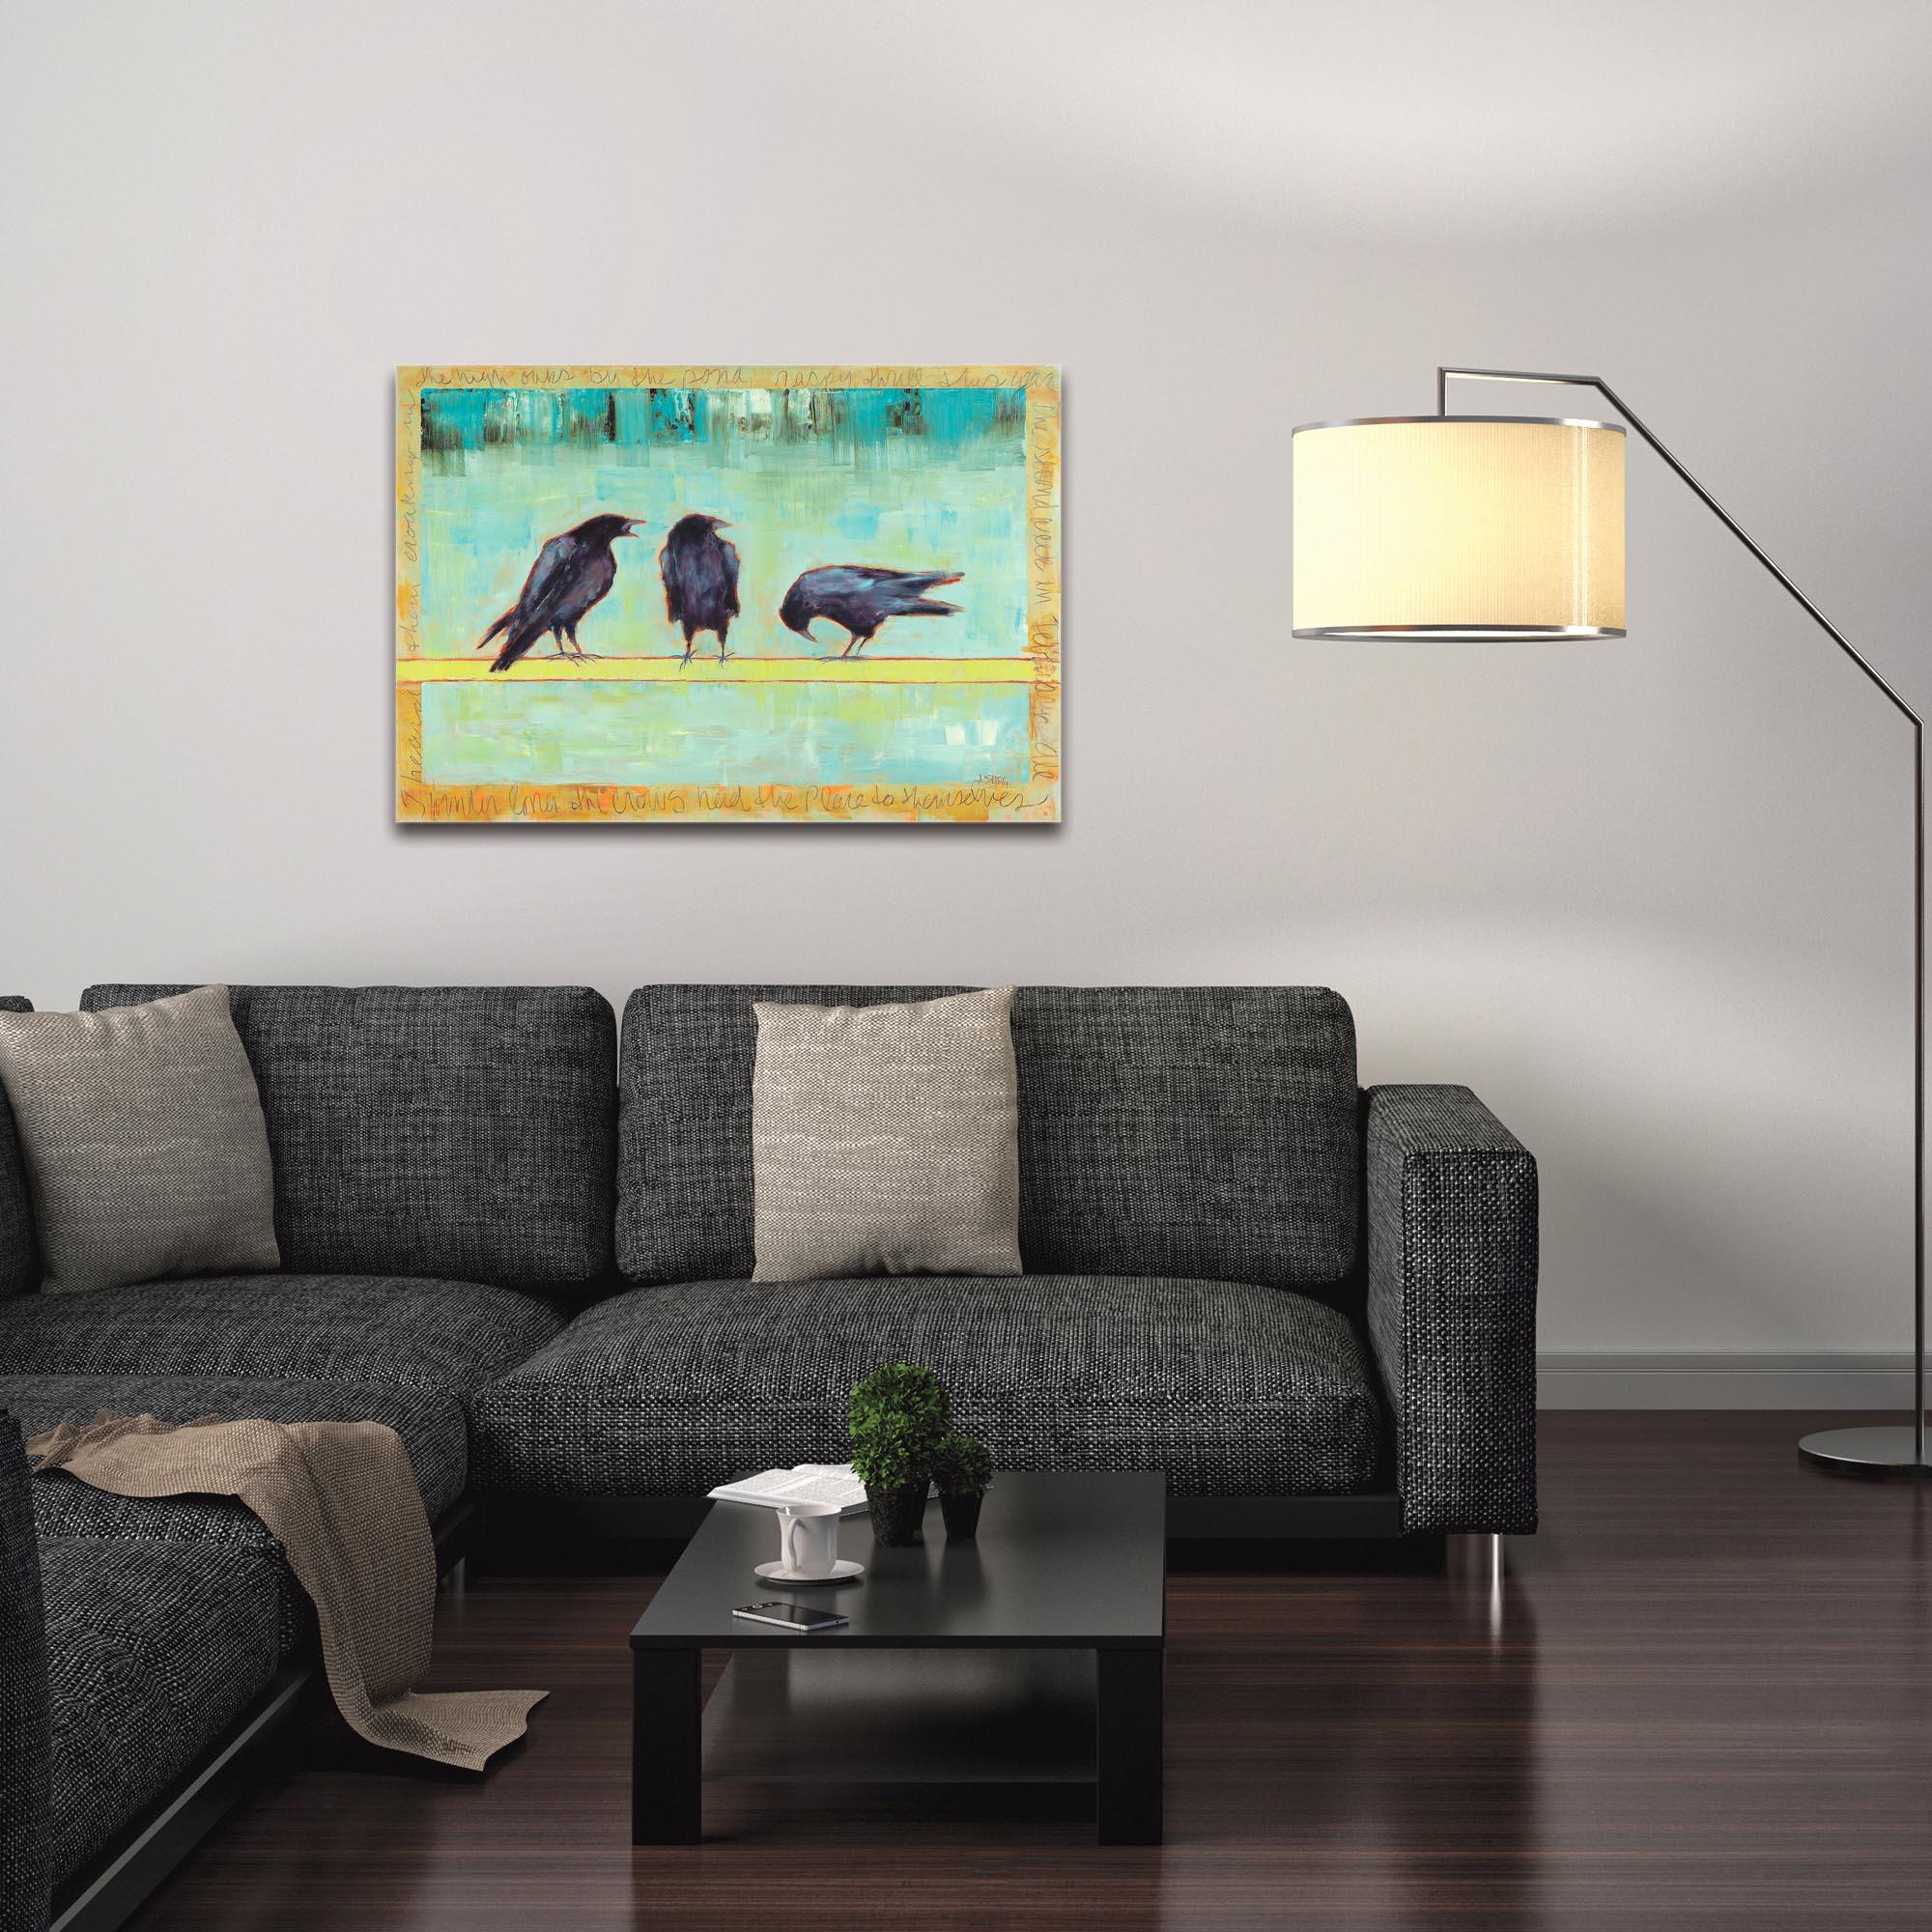 Contemporary Wall Art 'Crow Bar 1' - Urban Birds Decor on Metal or Plexiglass - Image 3